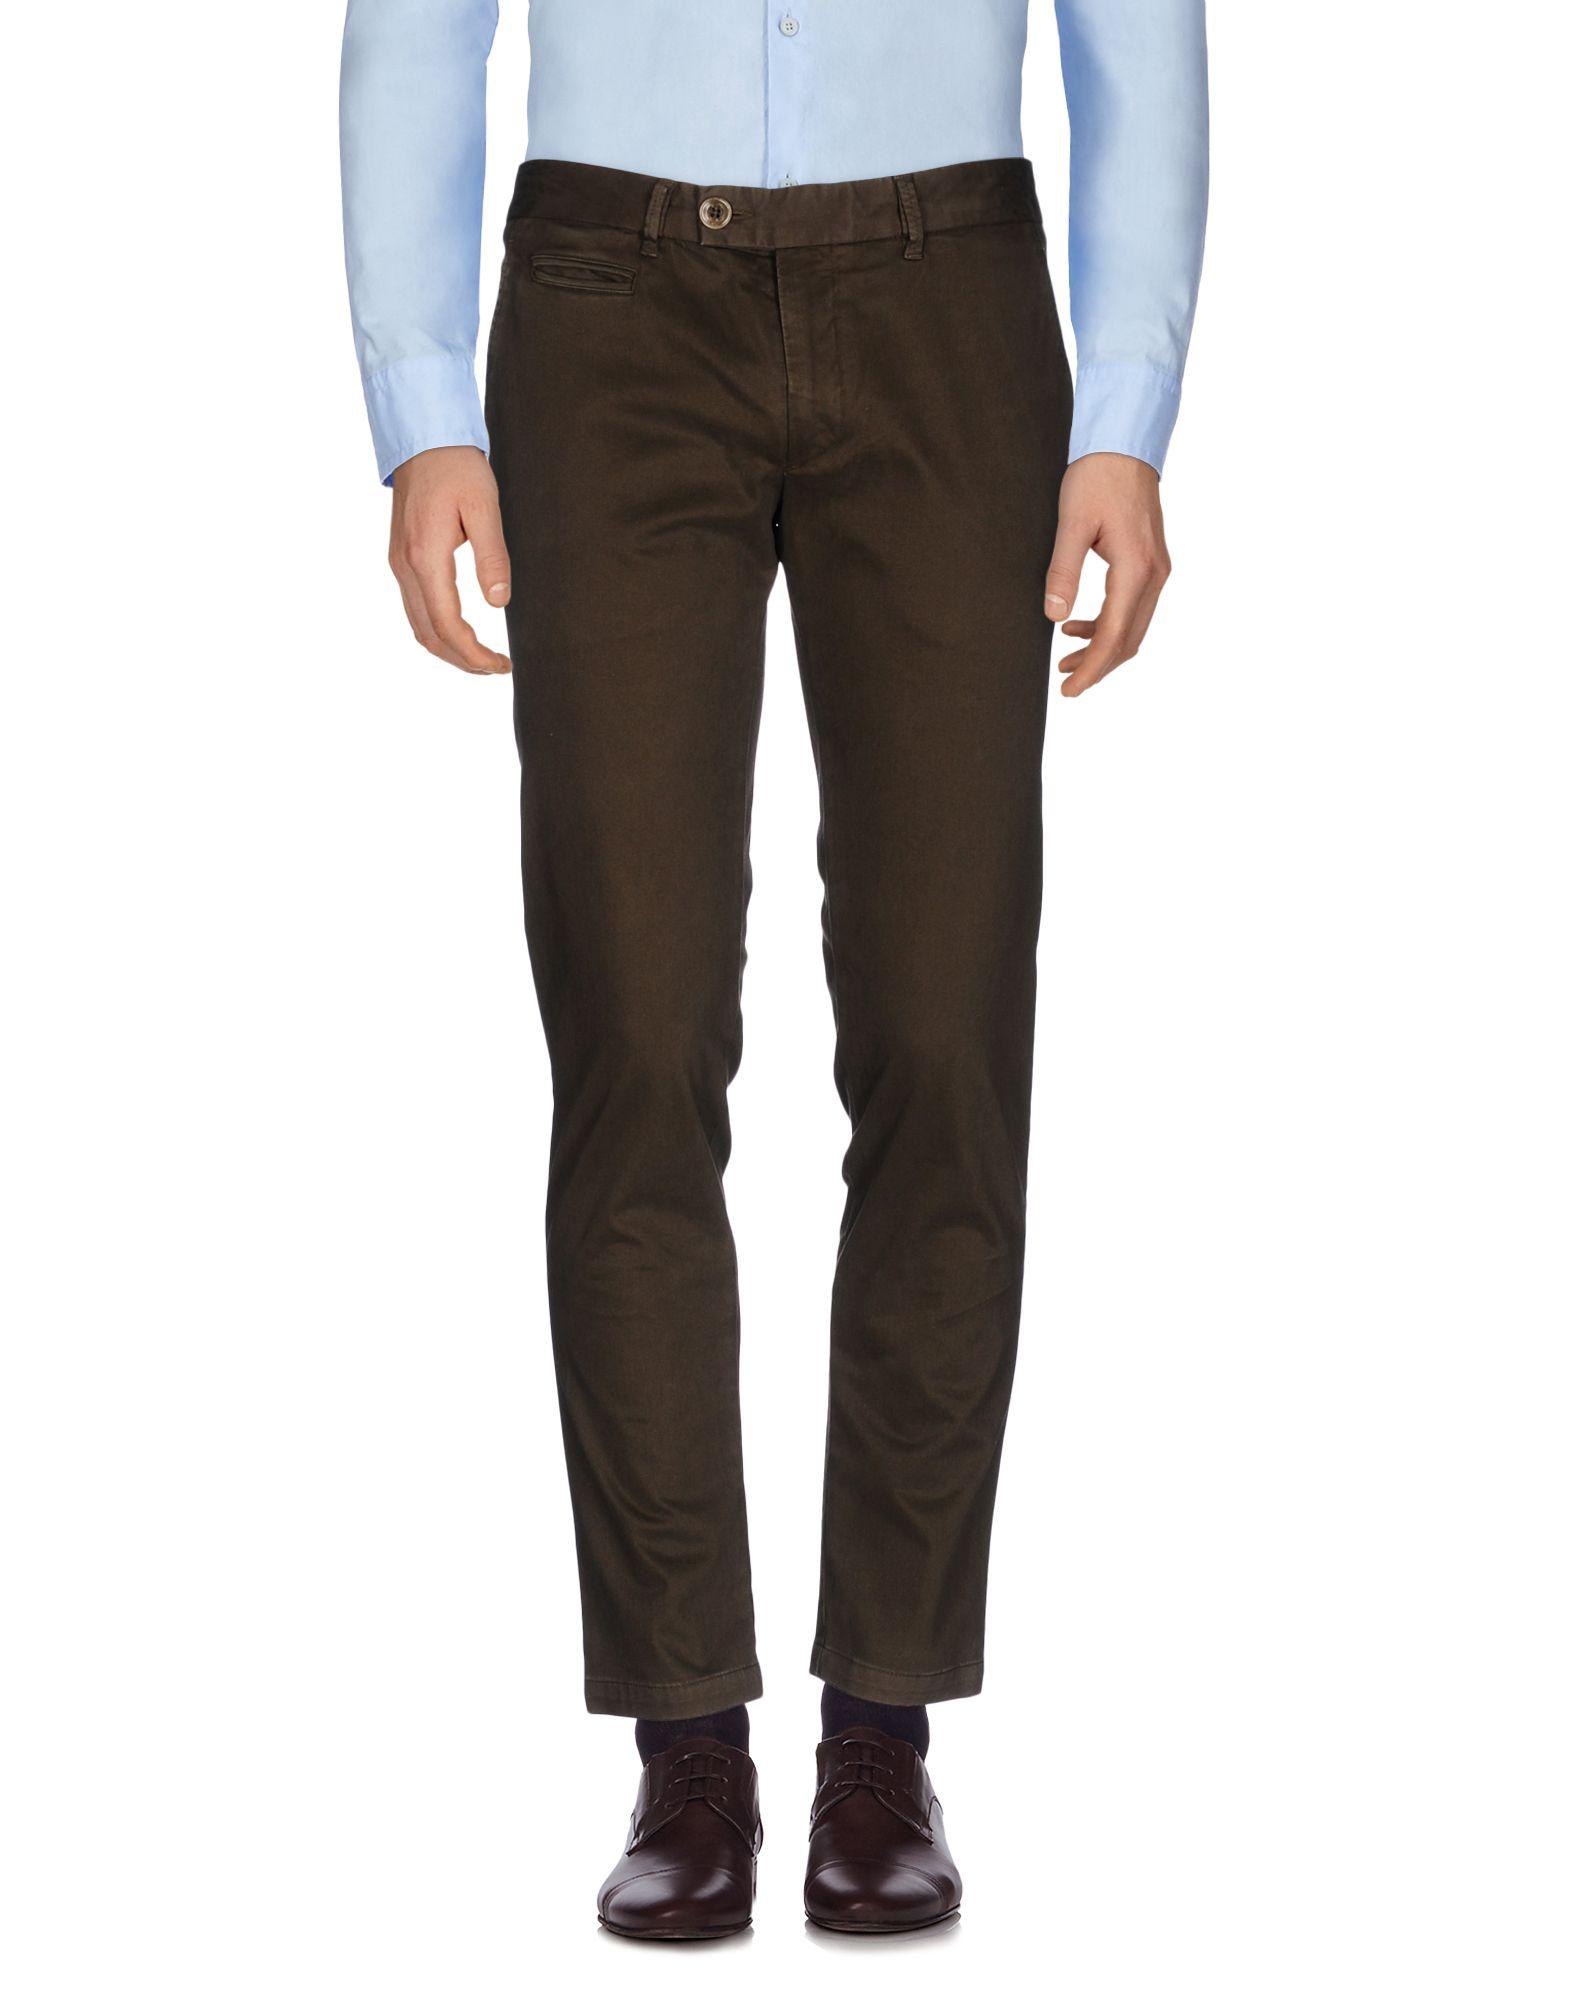 Pantalone Harry Harry & Sons uomo - 13038974BA  die beste Auswahl an